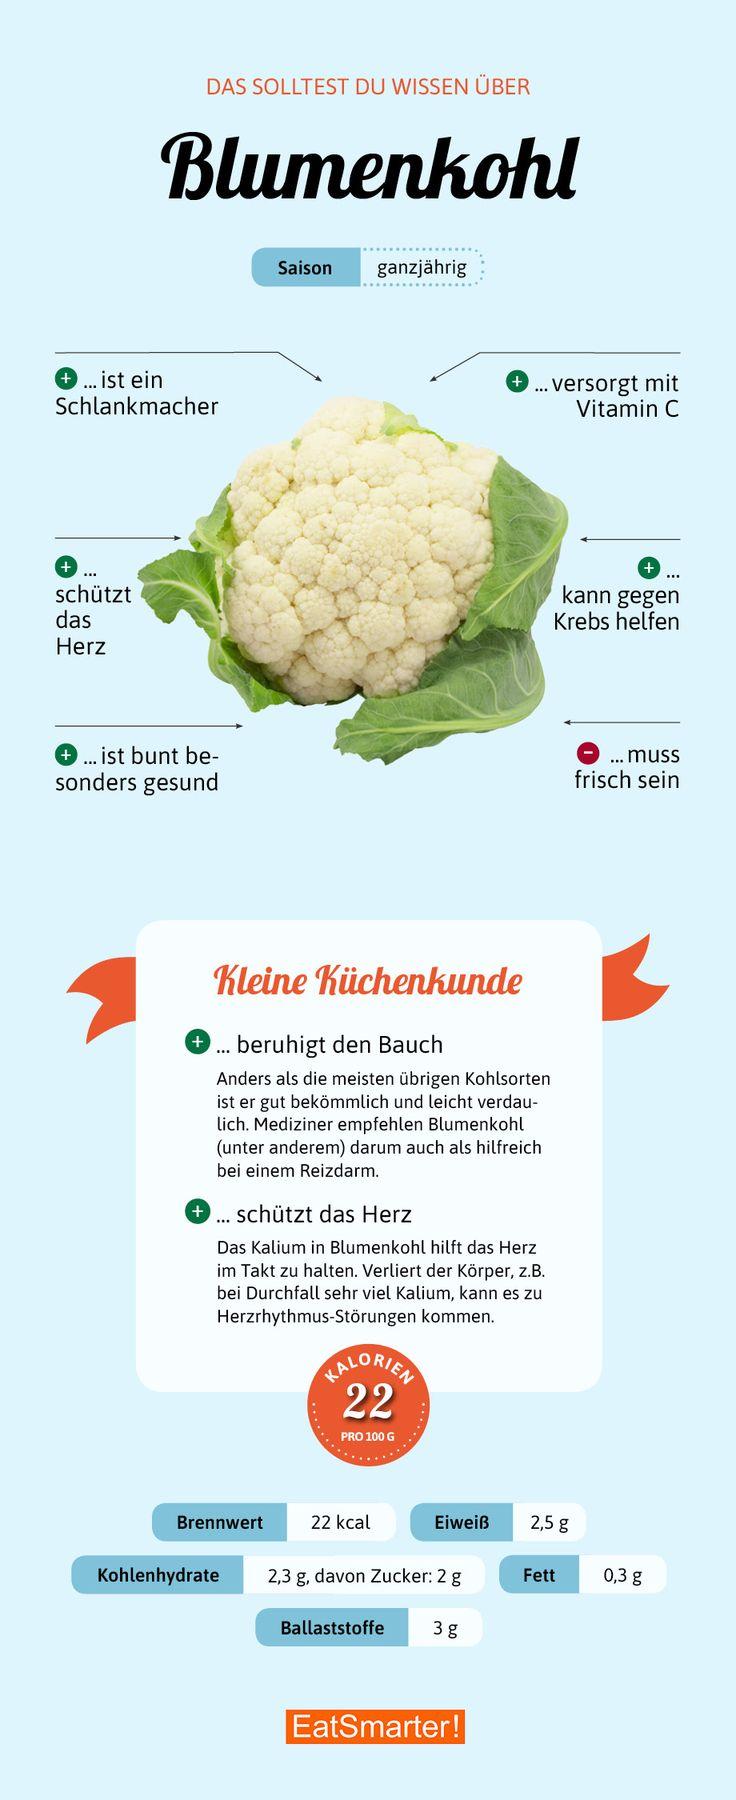 Blumenkohl – EAT SMARTER